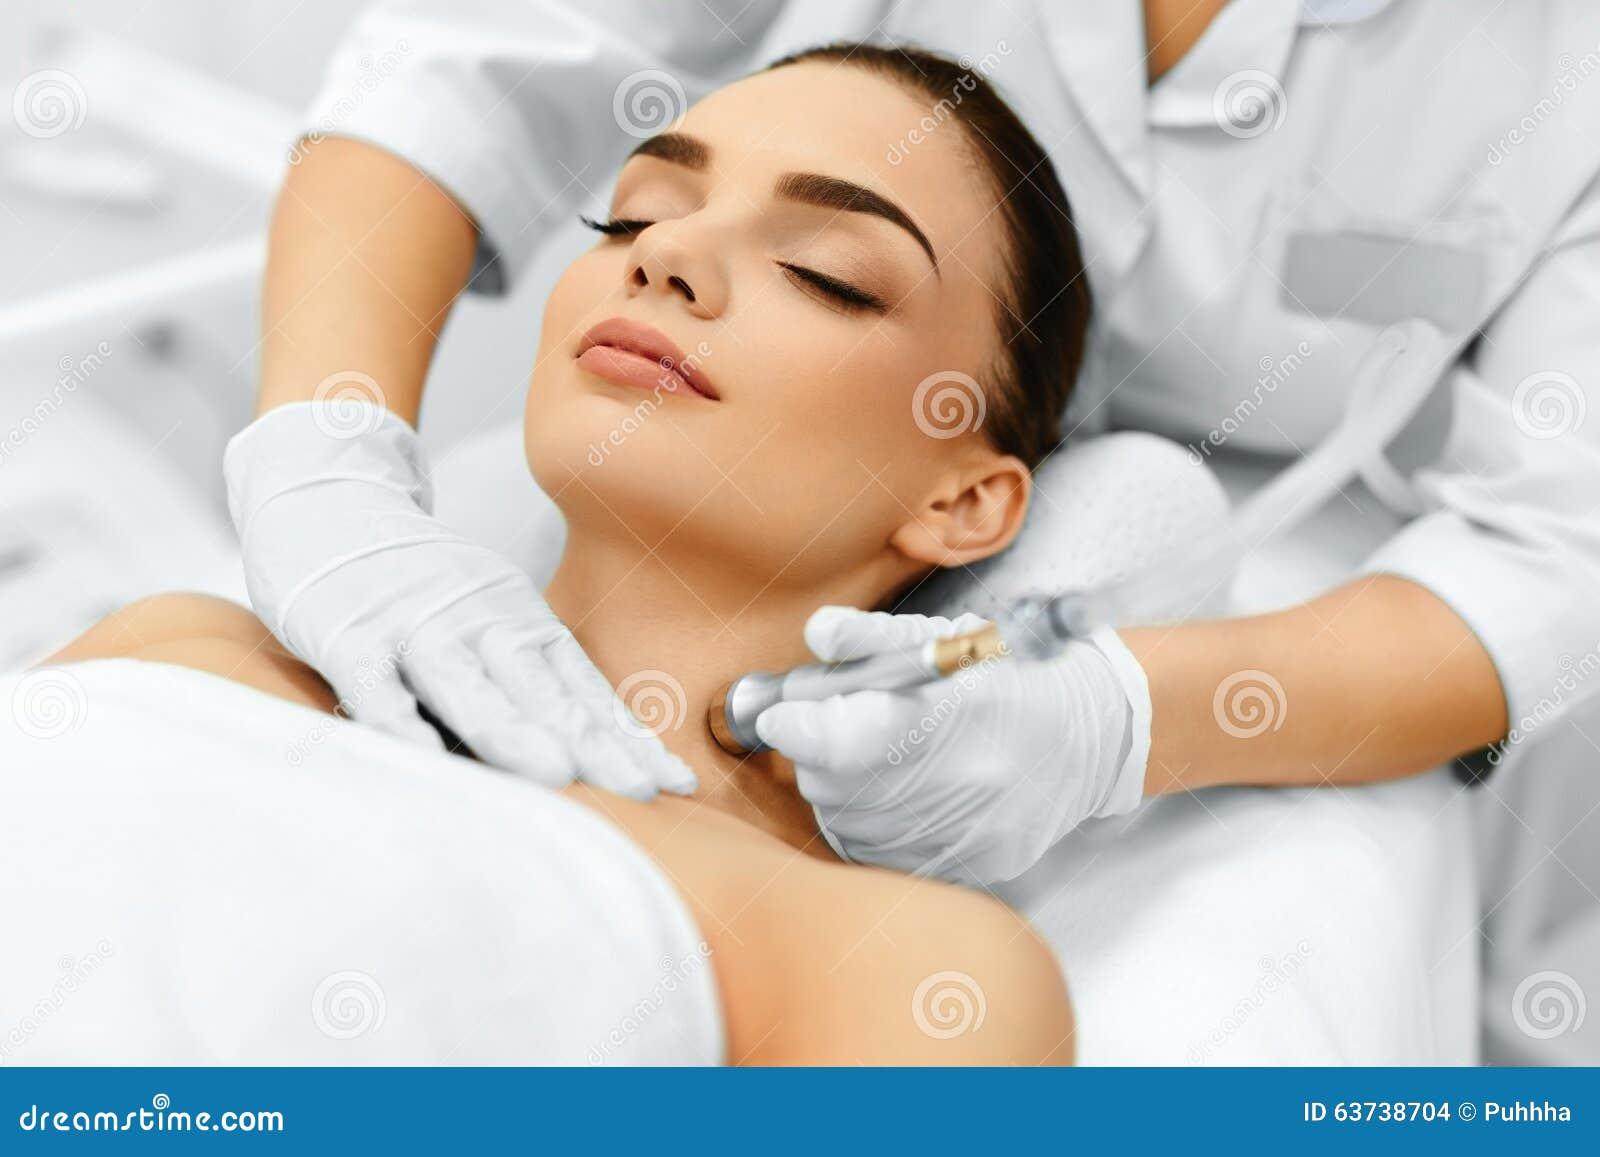 soins de la peau de visage diamond microdermabrasion peeling treatment bea photo stock image. Black Bedroom Furniture Sets. Home Design Ideas